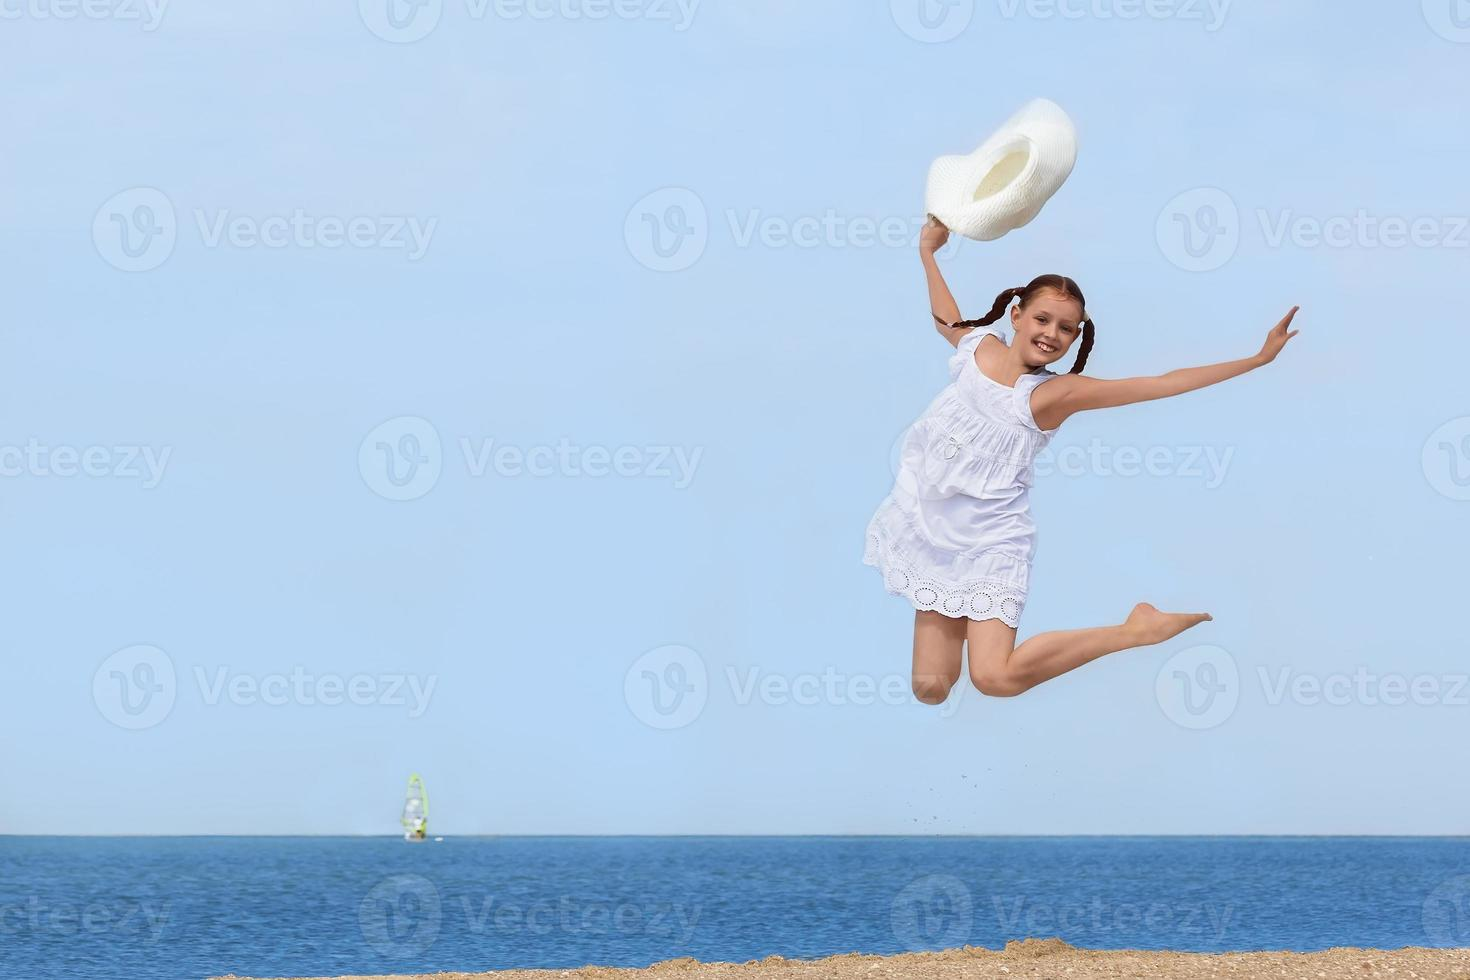 menina alegre pulando sobre a água na praia foto